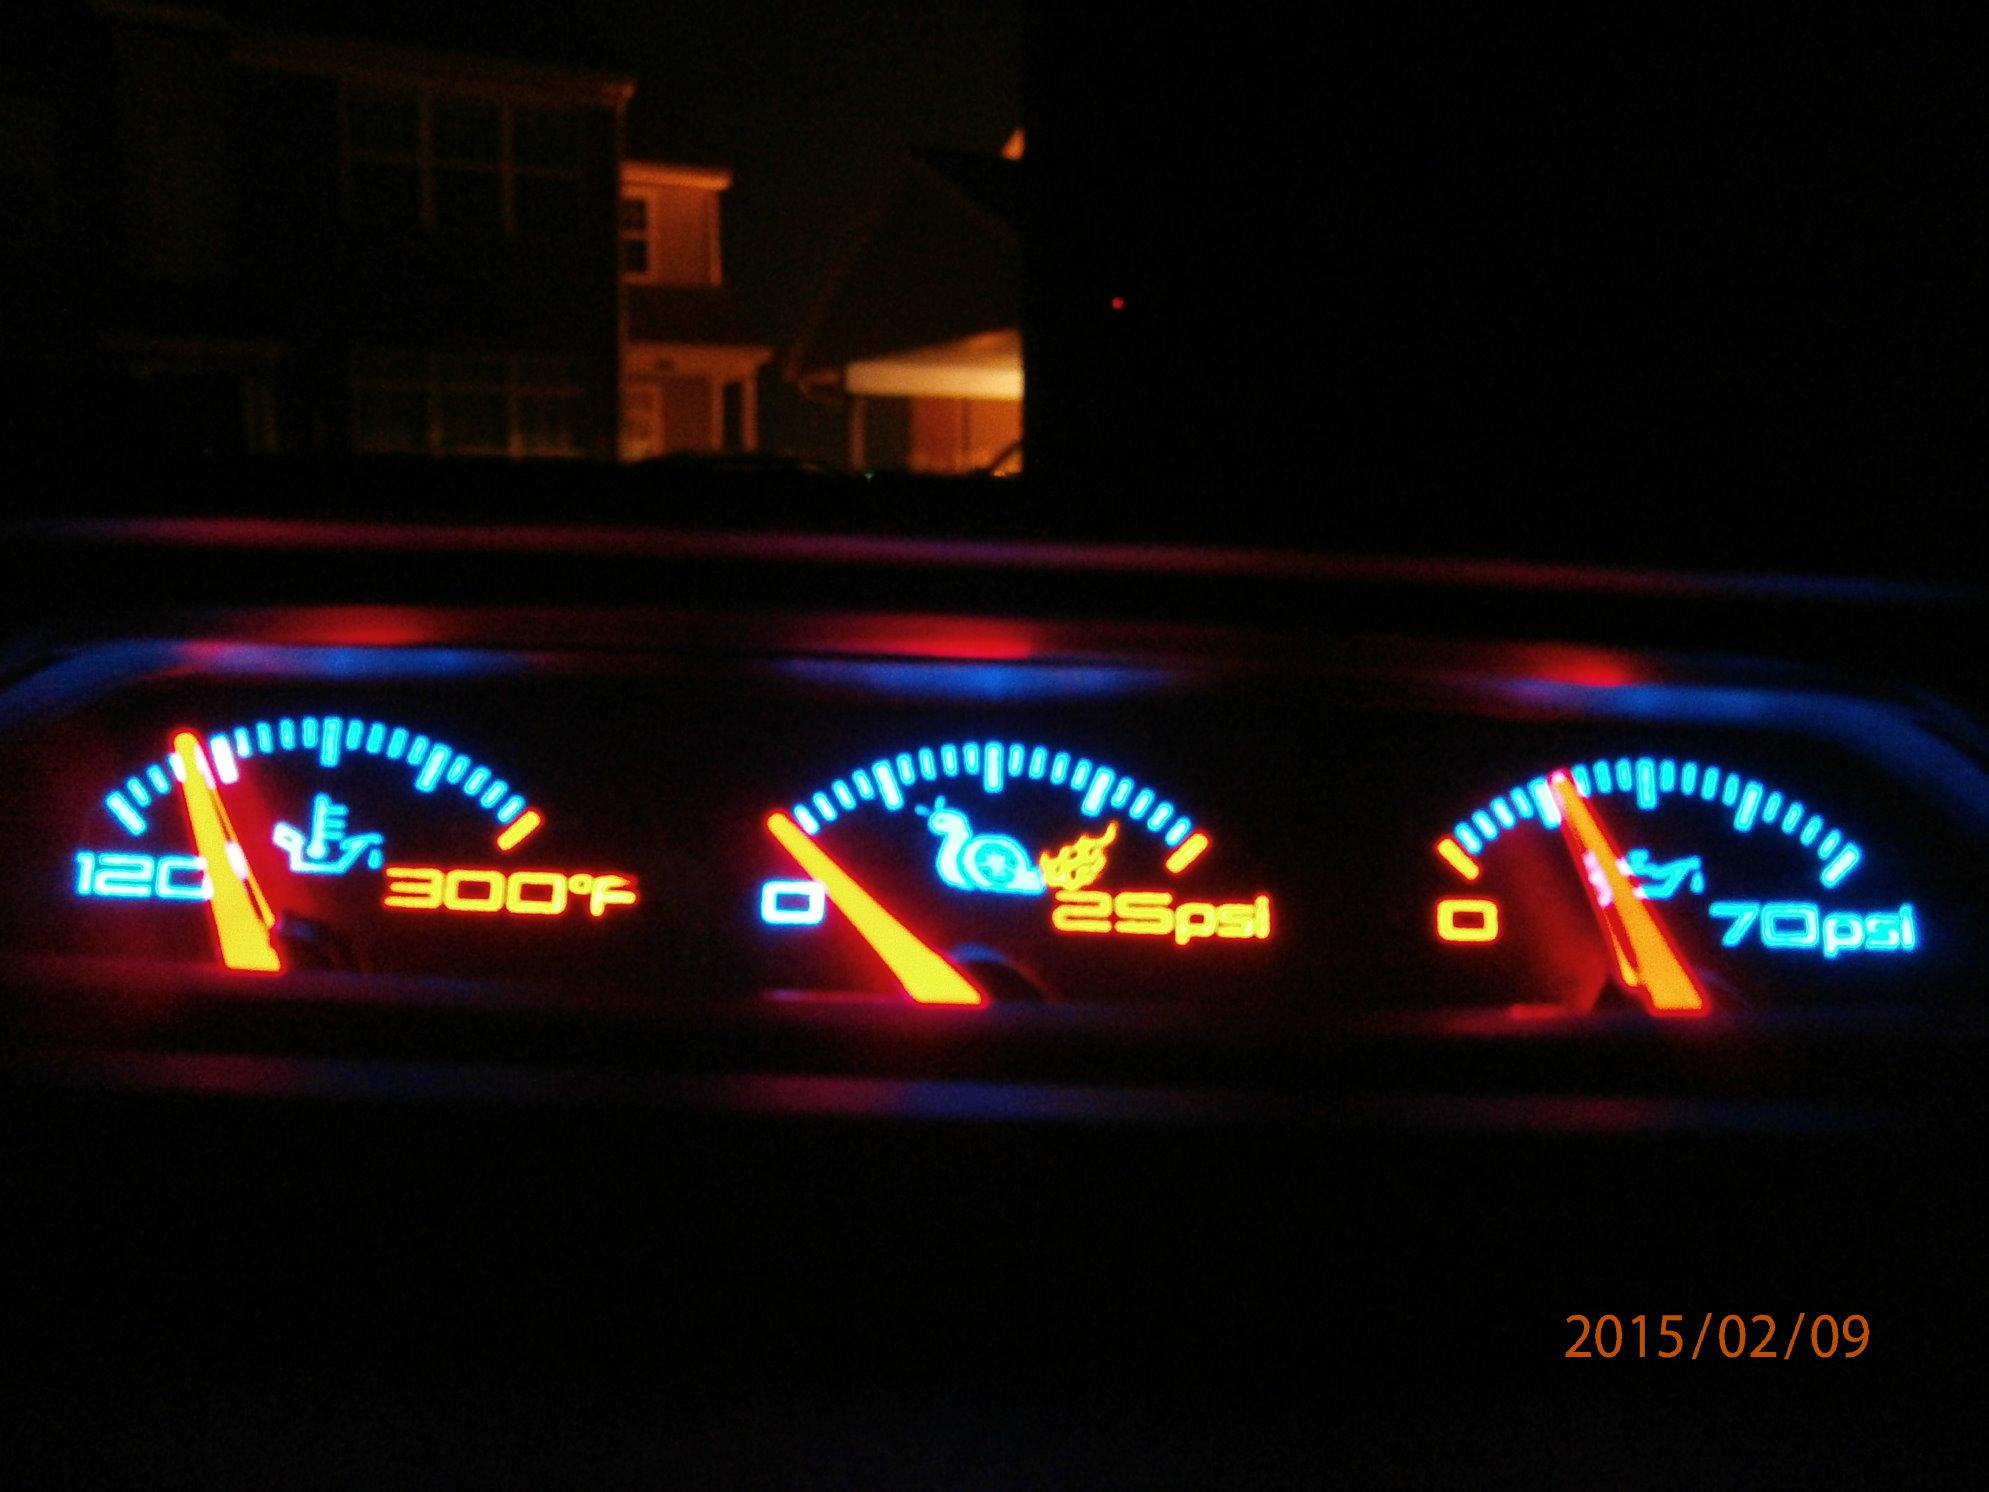 name custom gauge face plates 008 jpg views 1427 size 258 9